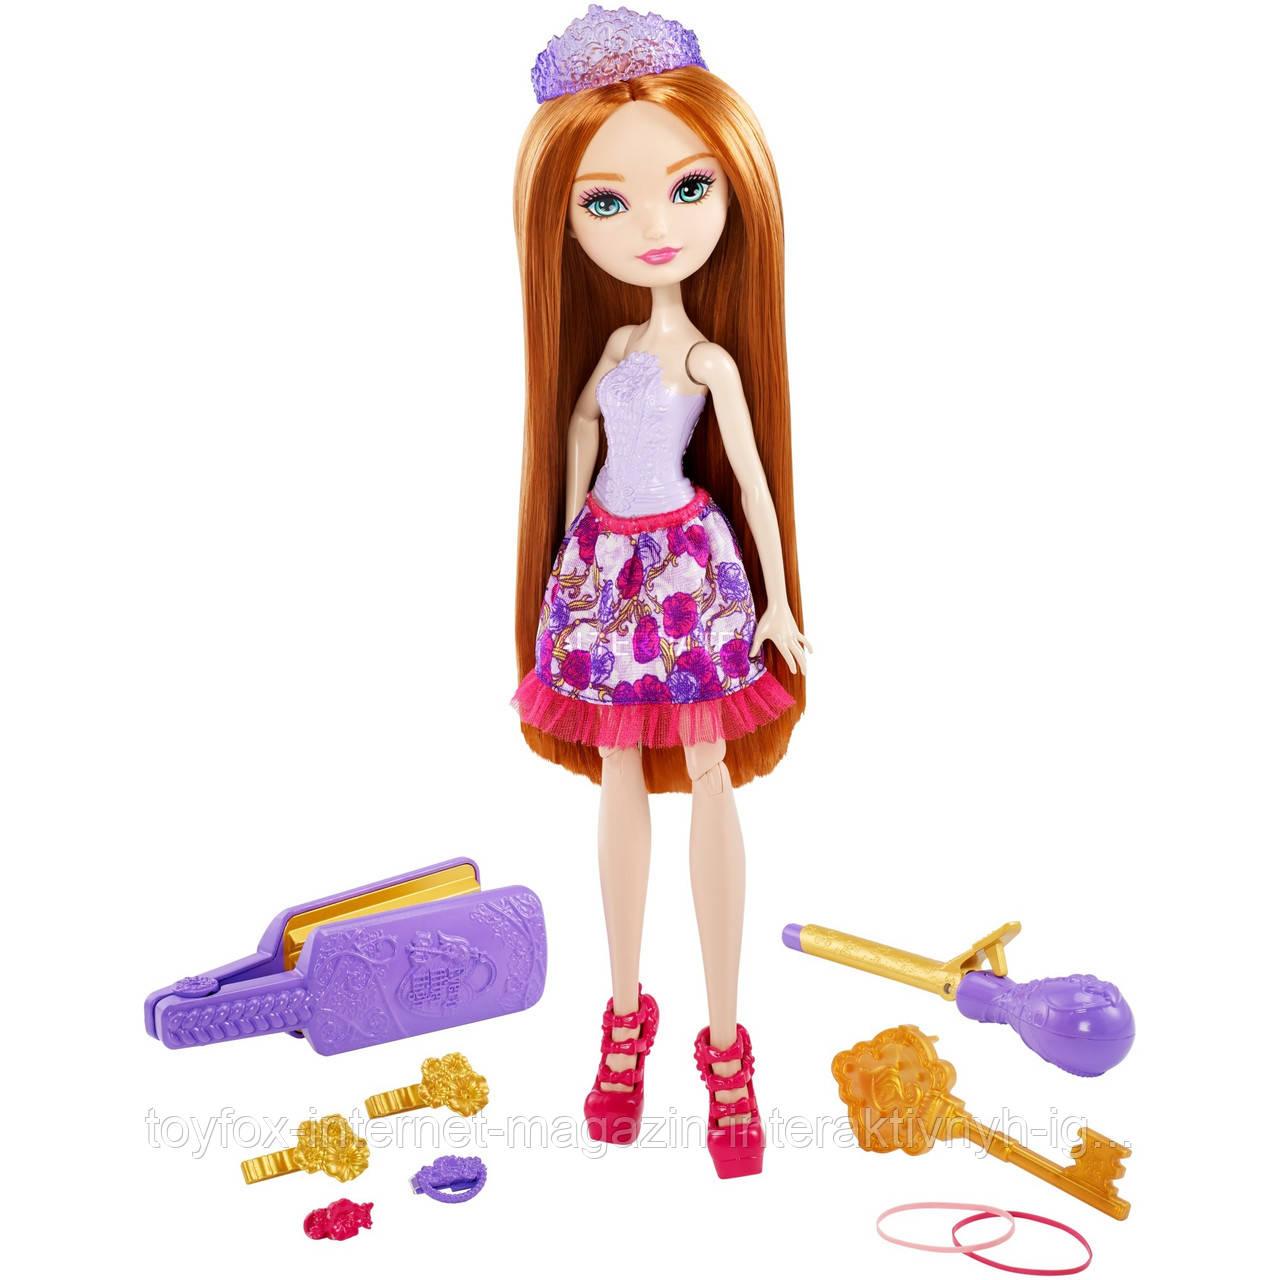 Кукла эвер афтер хай Холли - Ever After High Holly O'Hair Style - ToyFox - Интернет-магазин интерактивных игрушек  в Киеве